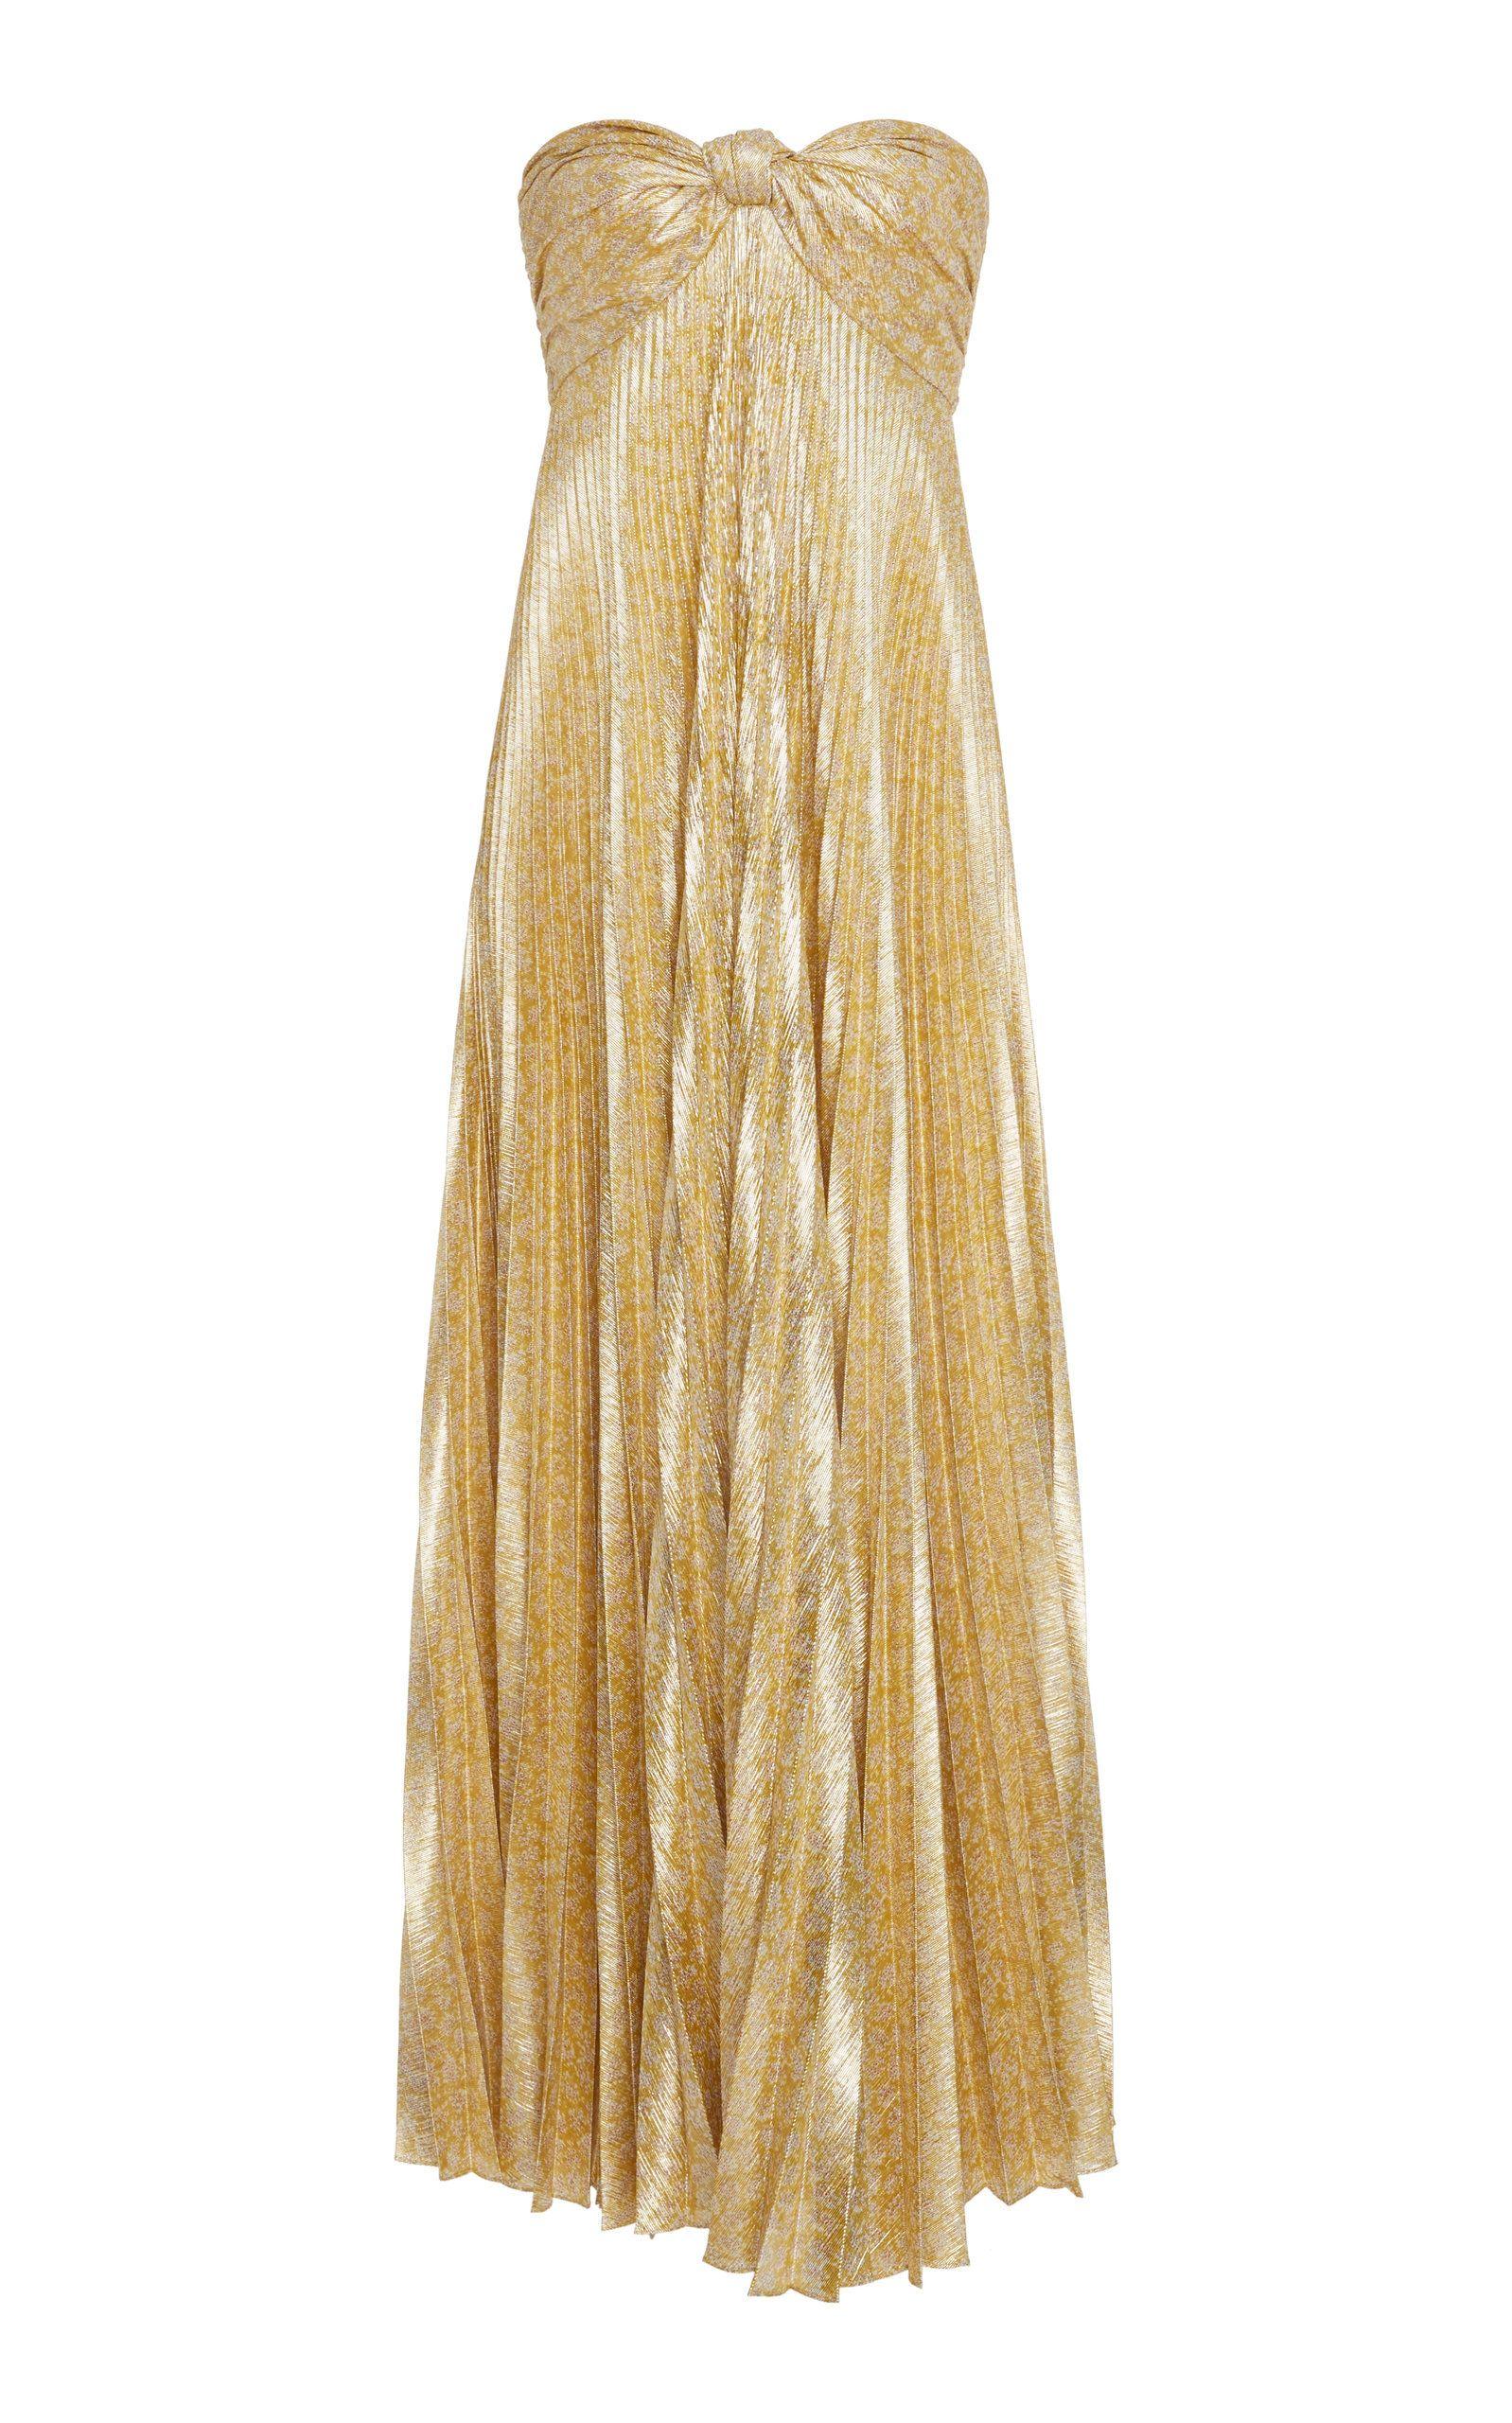 a1286687436f Joya Plissé Maxi Dress by ALEXIS for Preorder on Moda Operandi